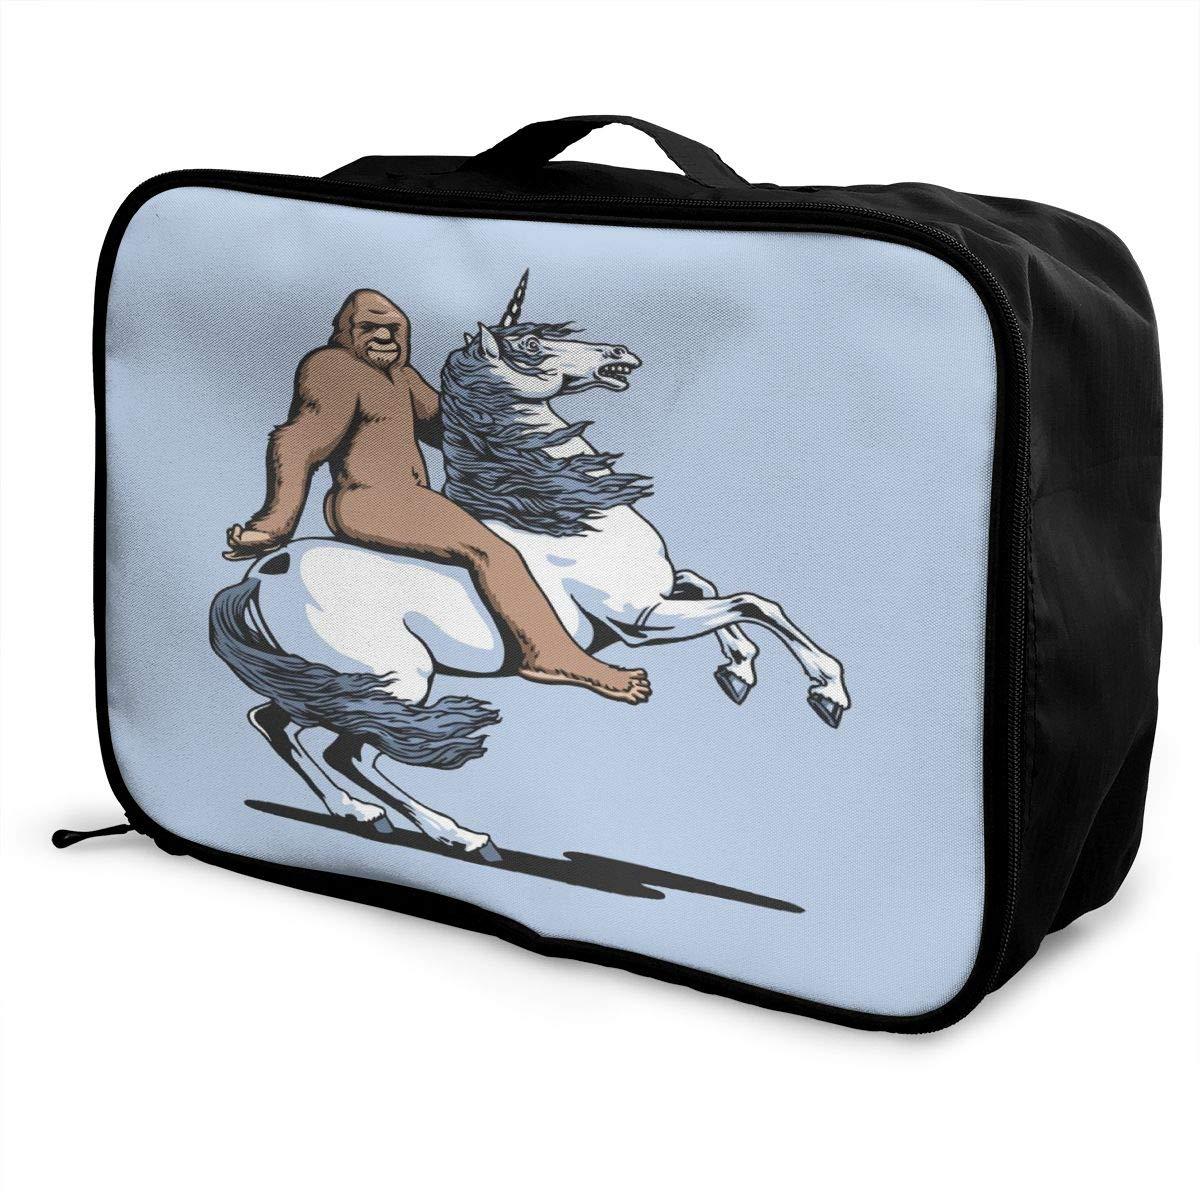 Sasquatch Bigfoot Riding Unicorn Travel Lightweight Waterproof Folding Storage Portable Luggage Duffle Tote Bag Large Capacity In Trolley Handle Bags 6x11x15 Inch